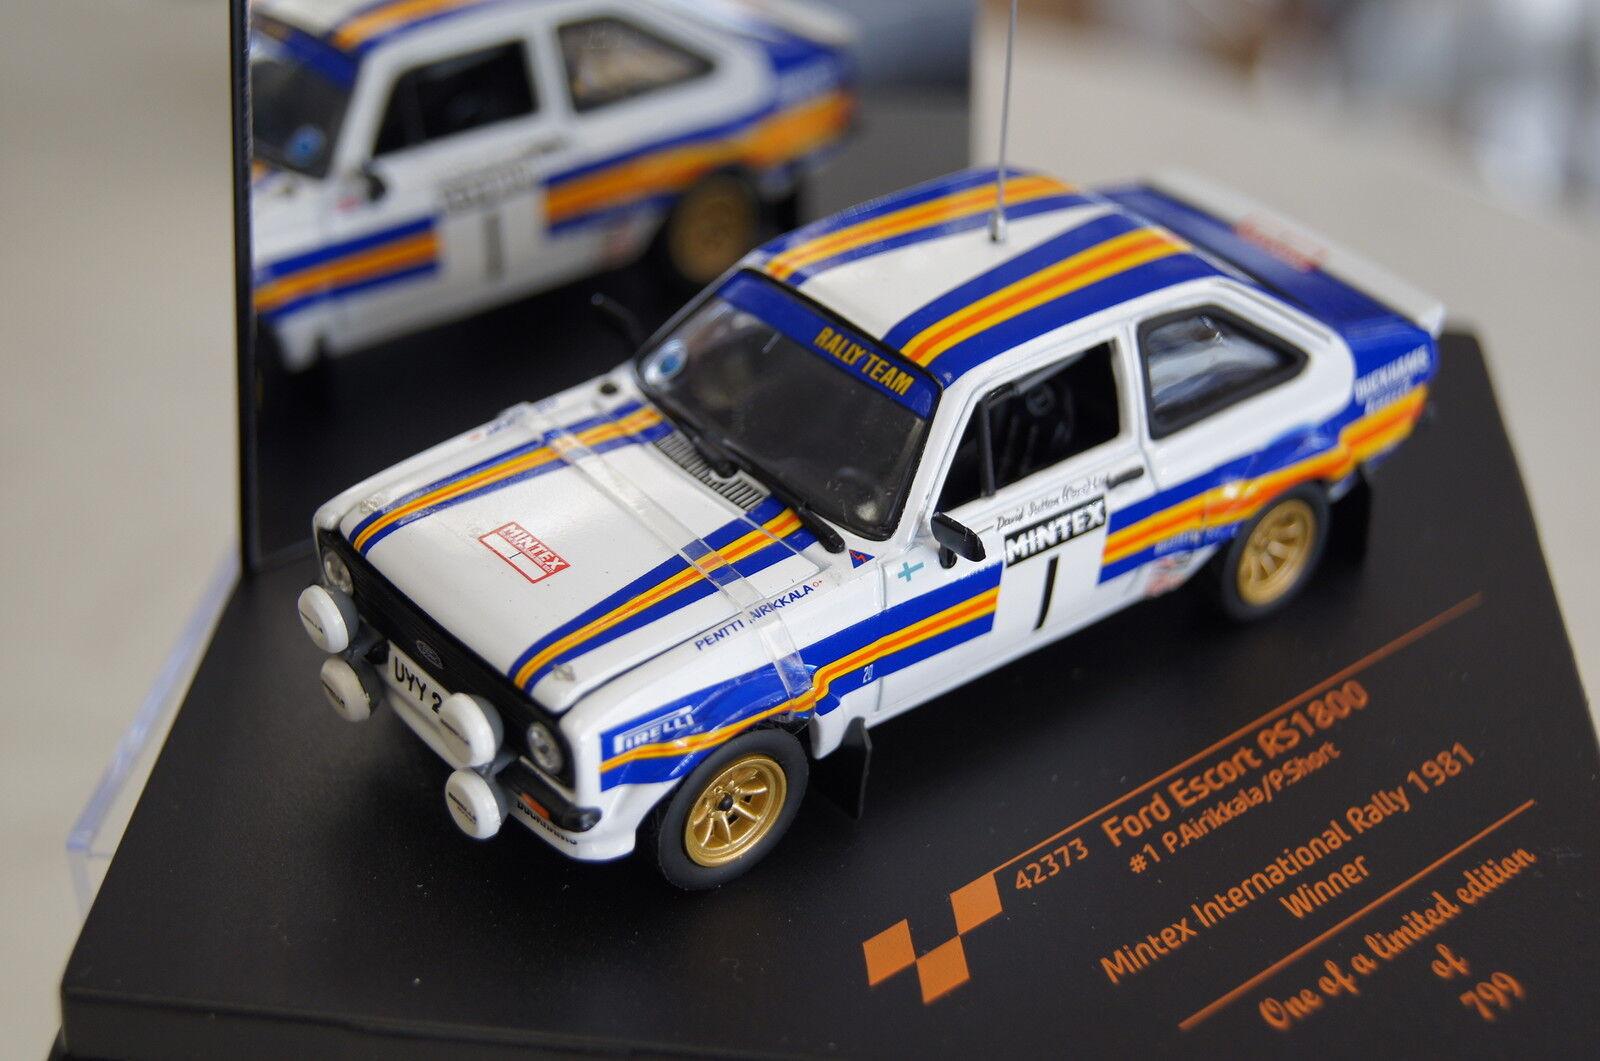 Ford Escort RS 1800 Winner Mintex Rally 1981  1 1 43 Vitesse neu & OVP  | Umweltfreundlich